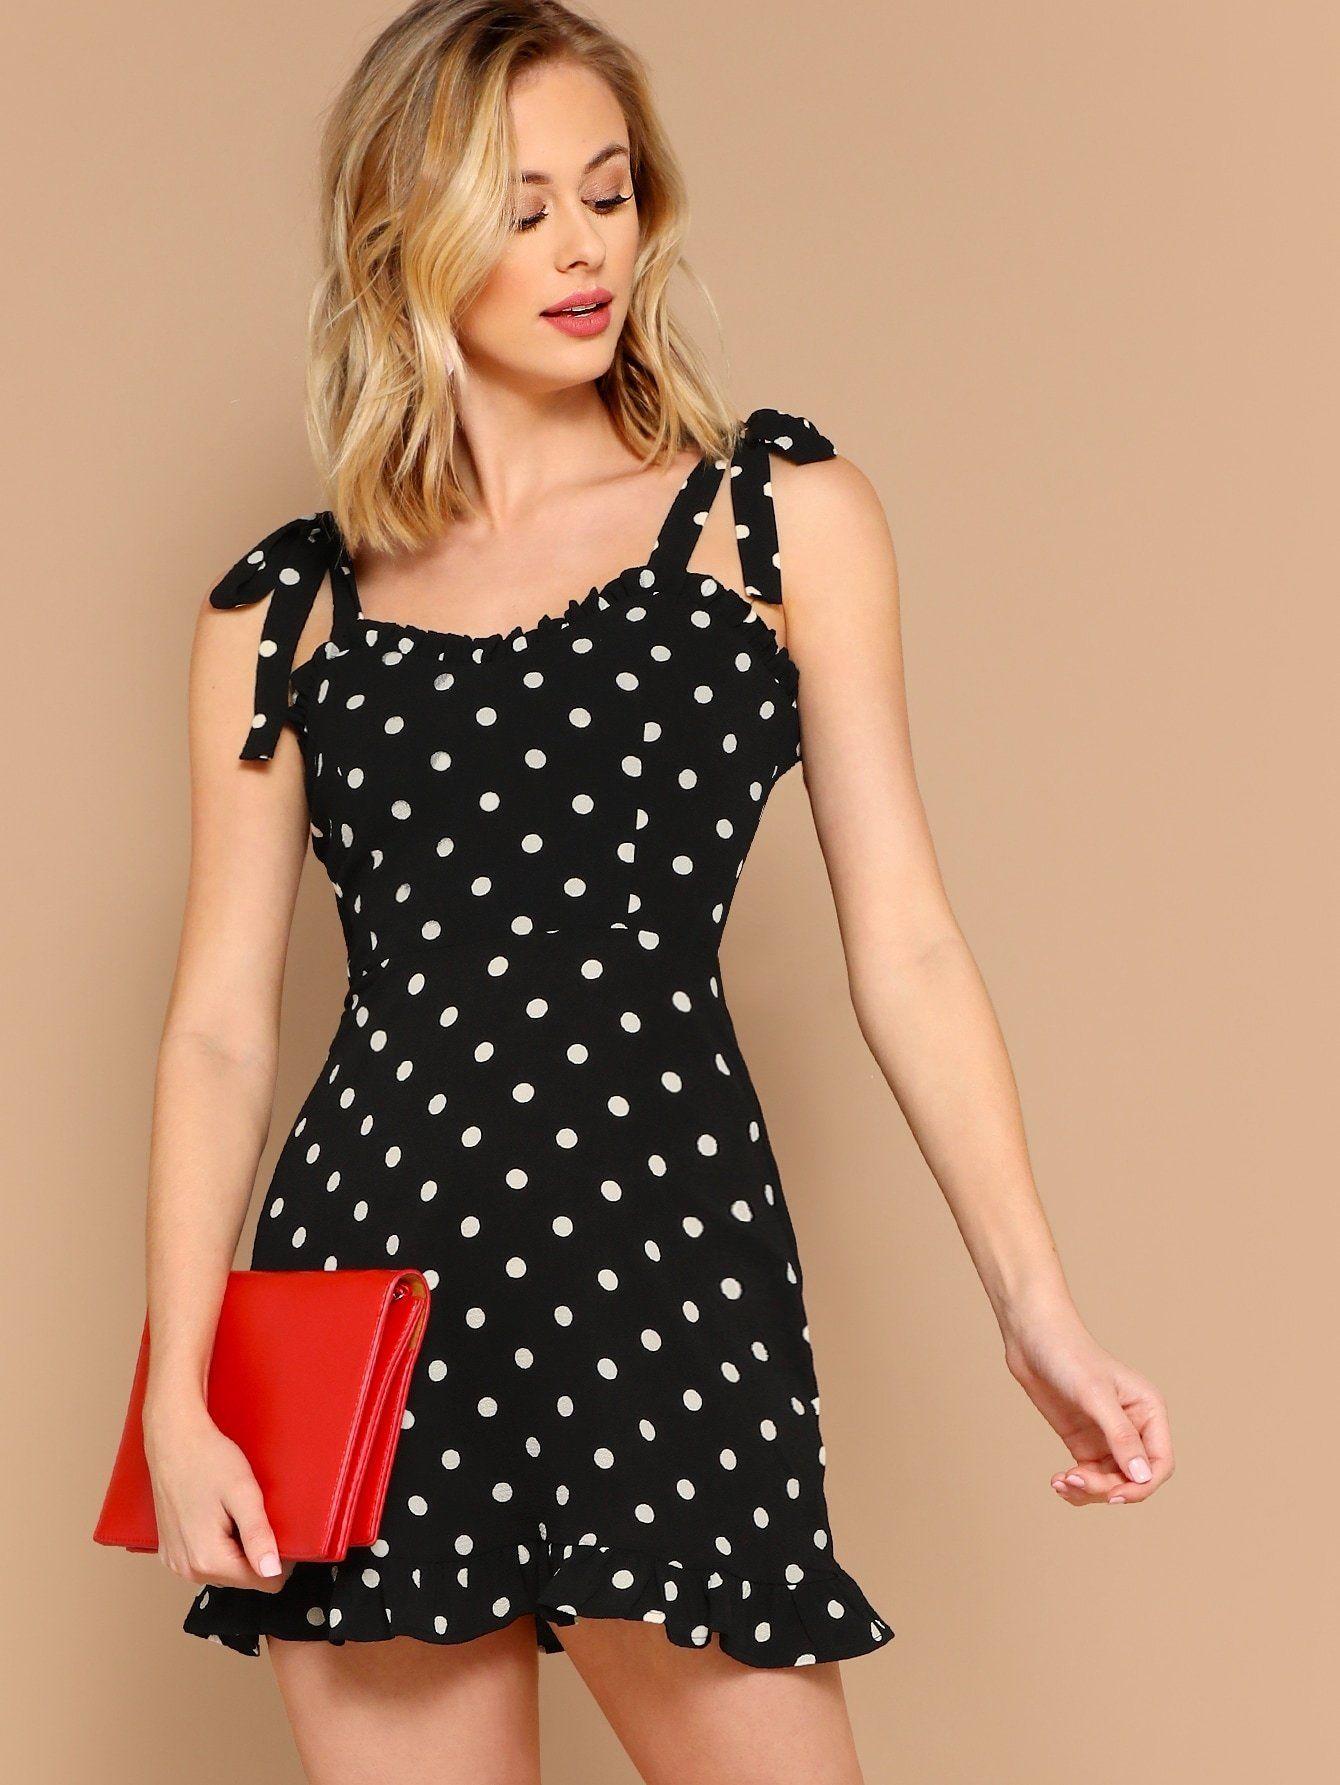 98373e1261953 Ruffle Trim Tie Straps Polka Dot Sleeveless Dress in 2019   Products ...